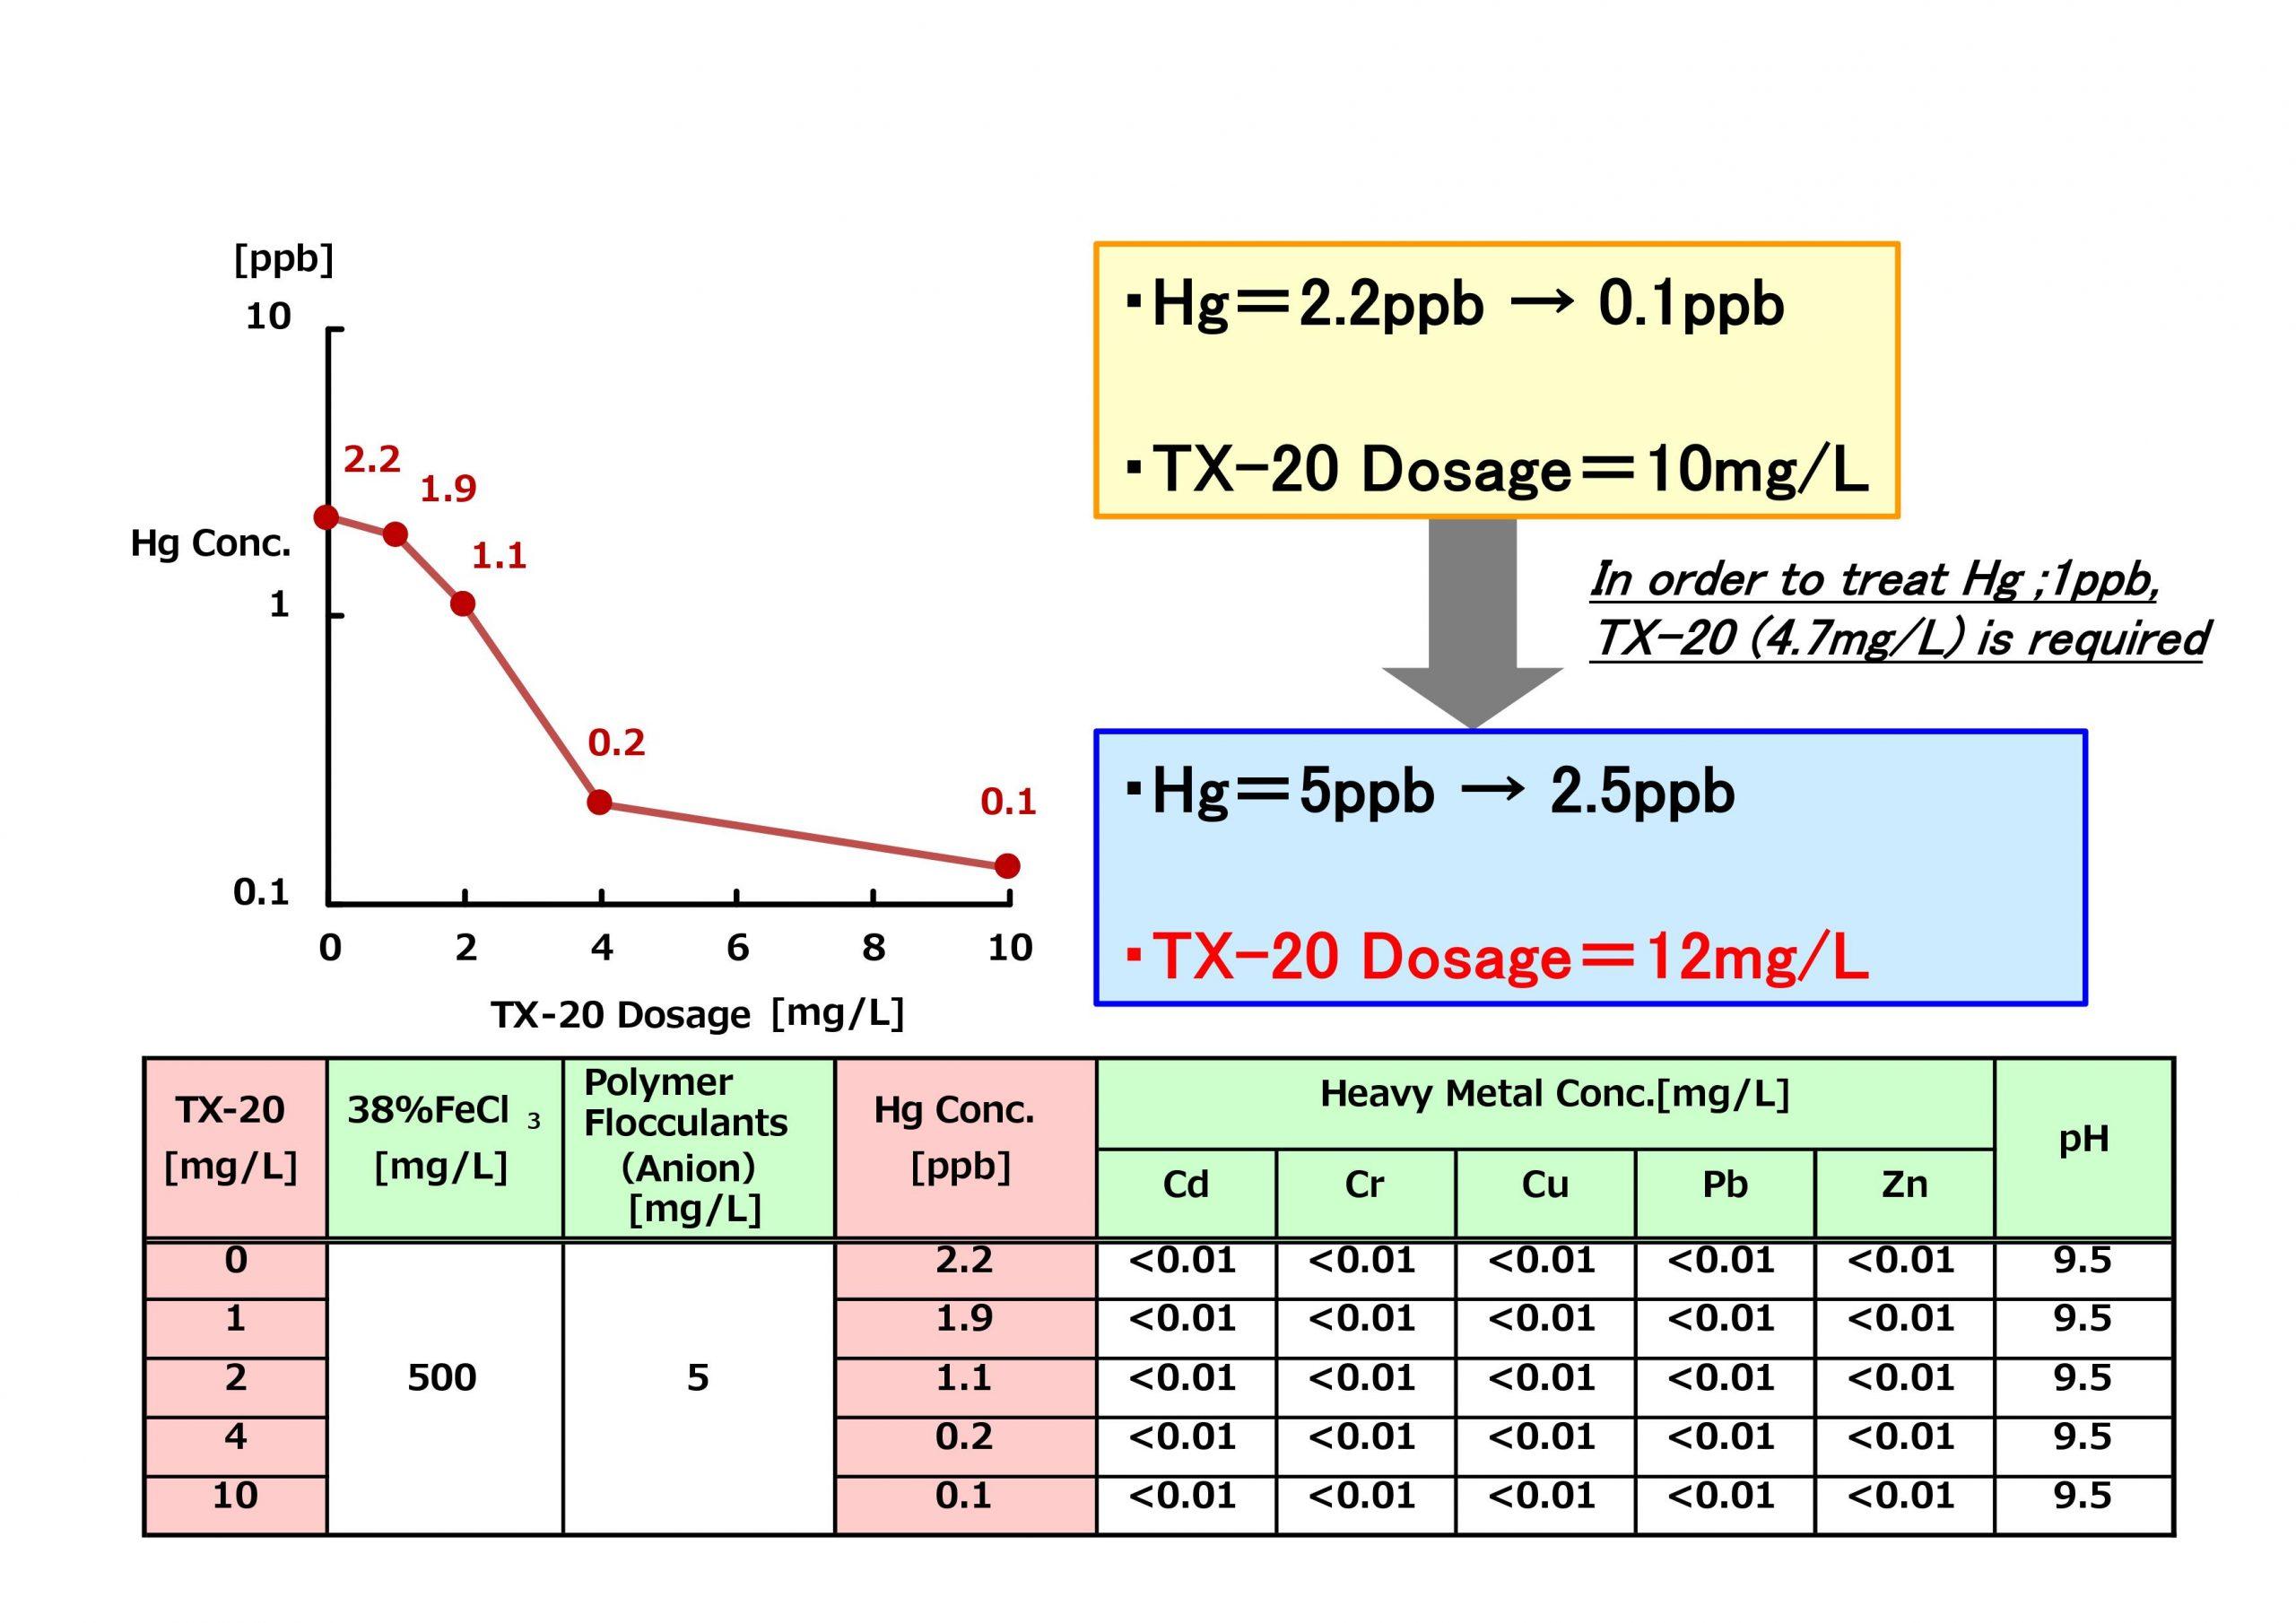 Dosage image 1